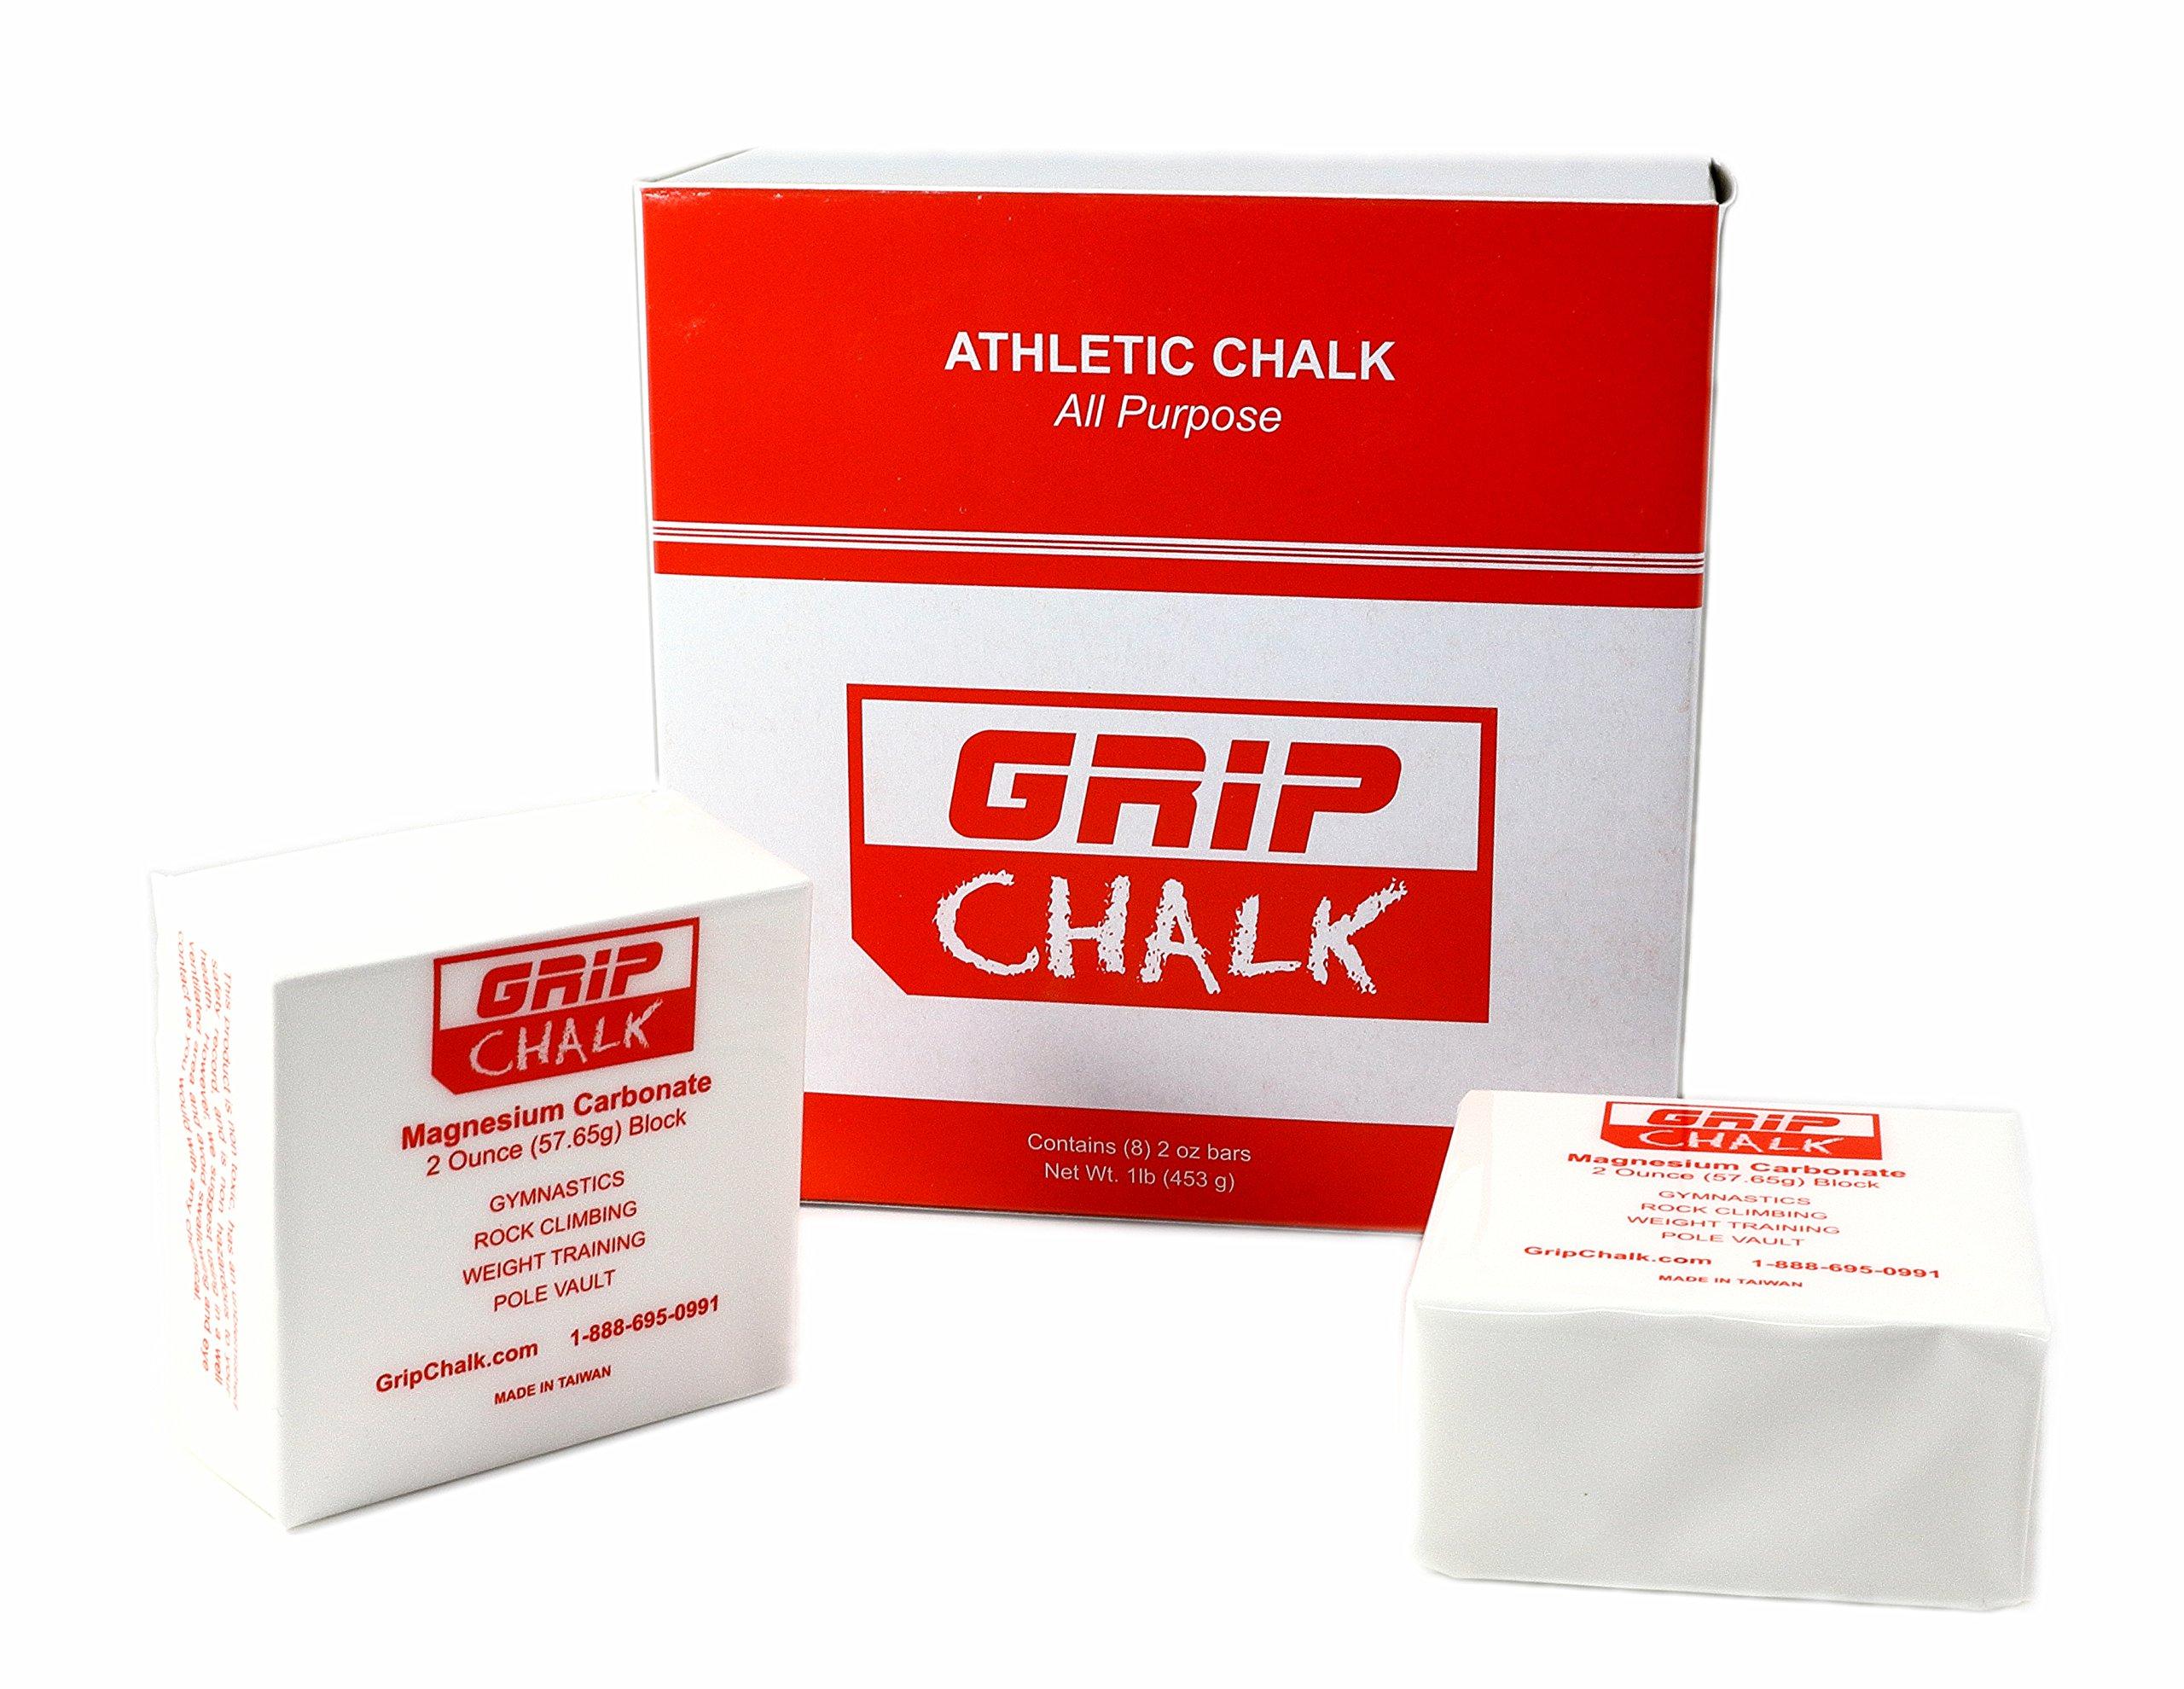 Gym Chalk Gymnastics, Rock Climbing, Power Lifting, Crossfit No Slip, No Moisture Chalk 1lb